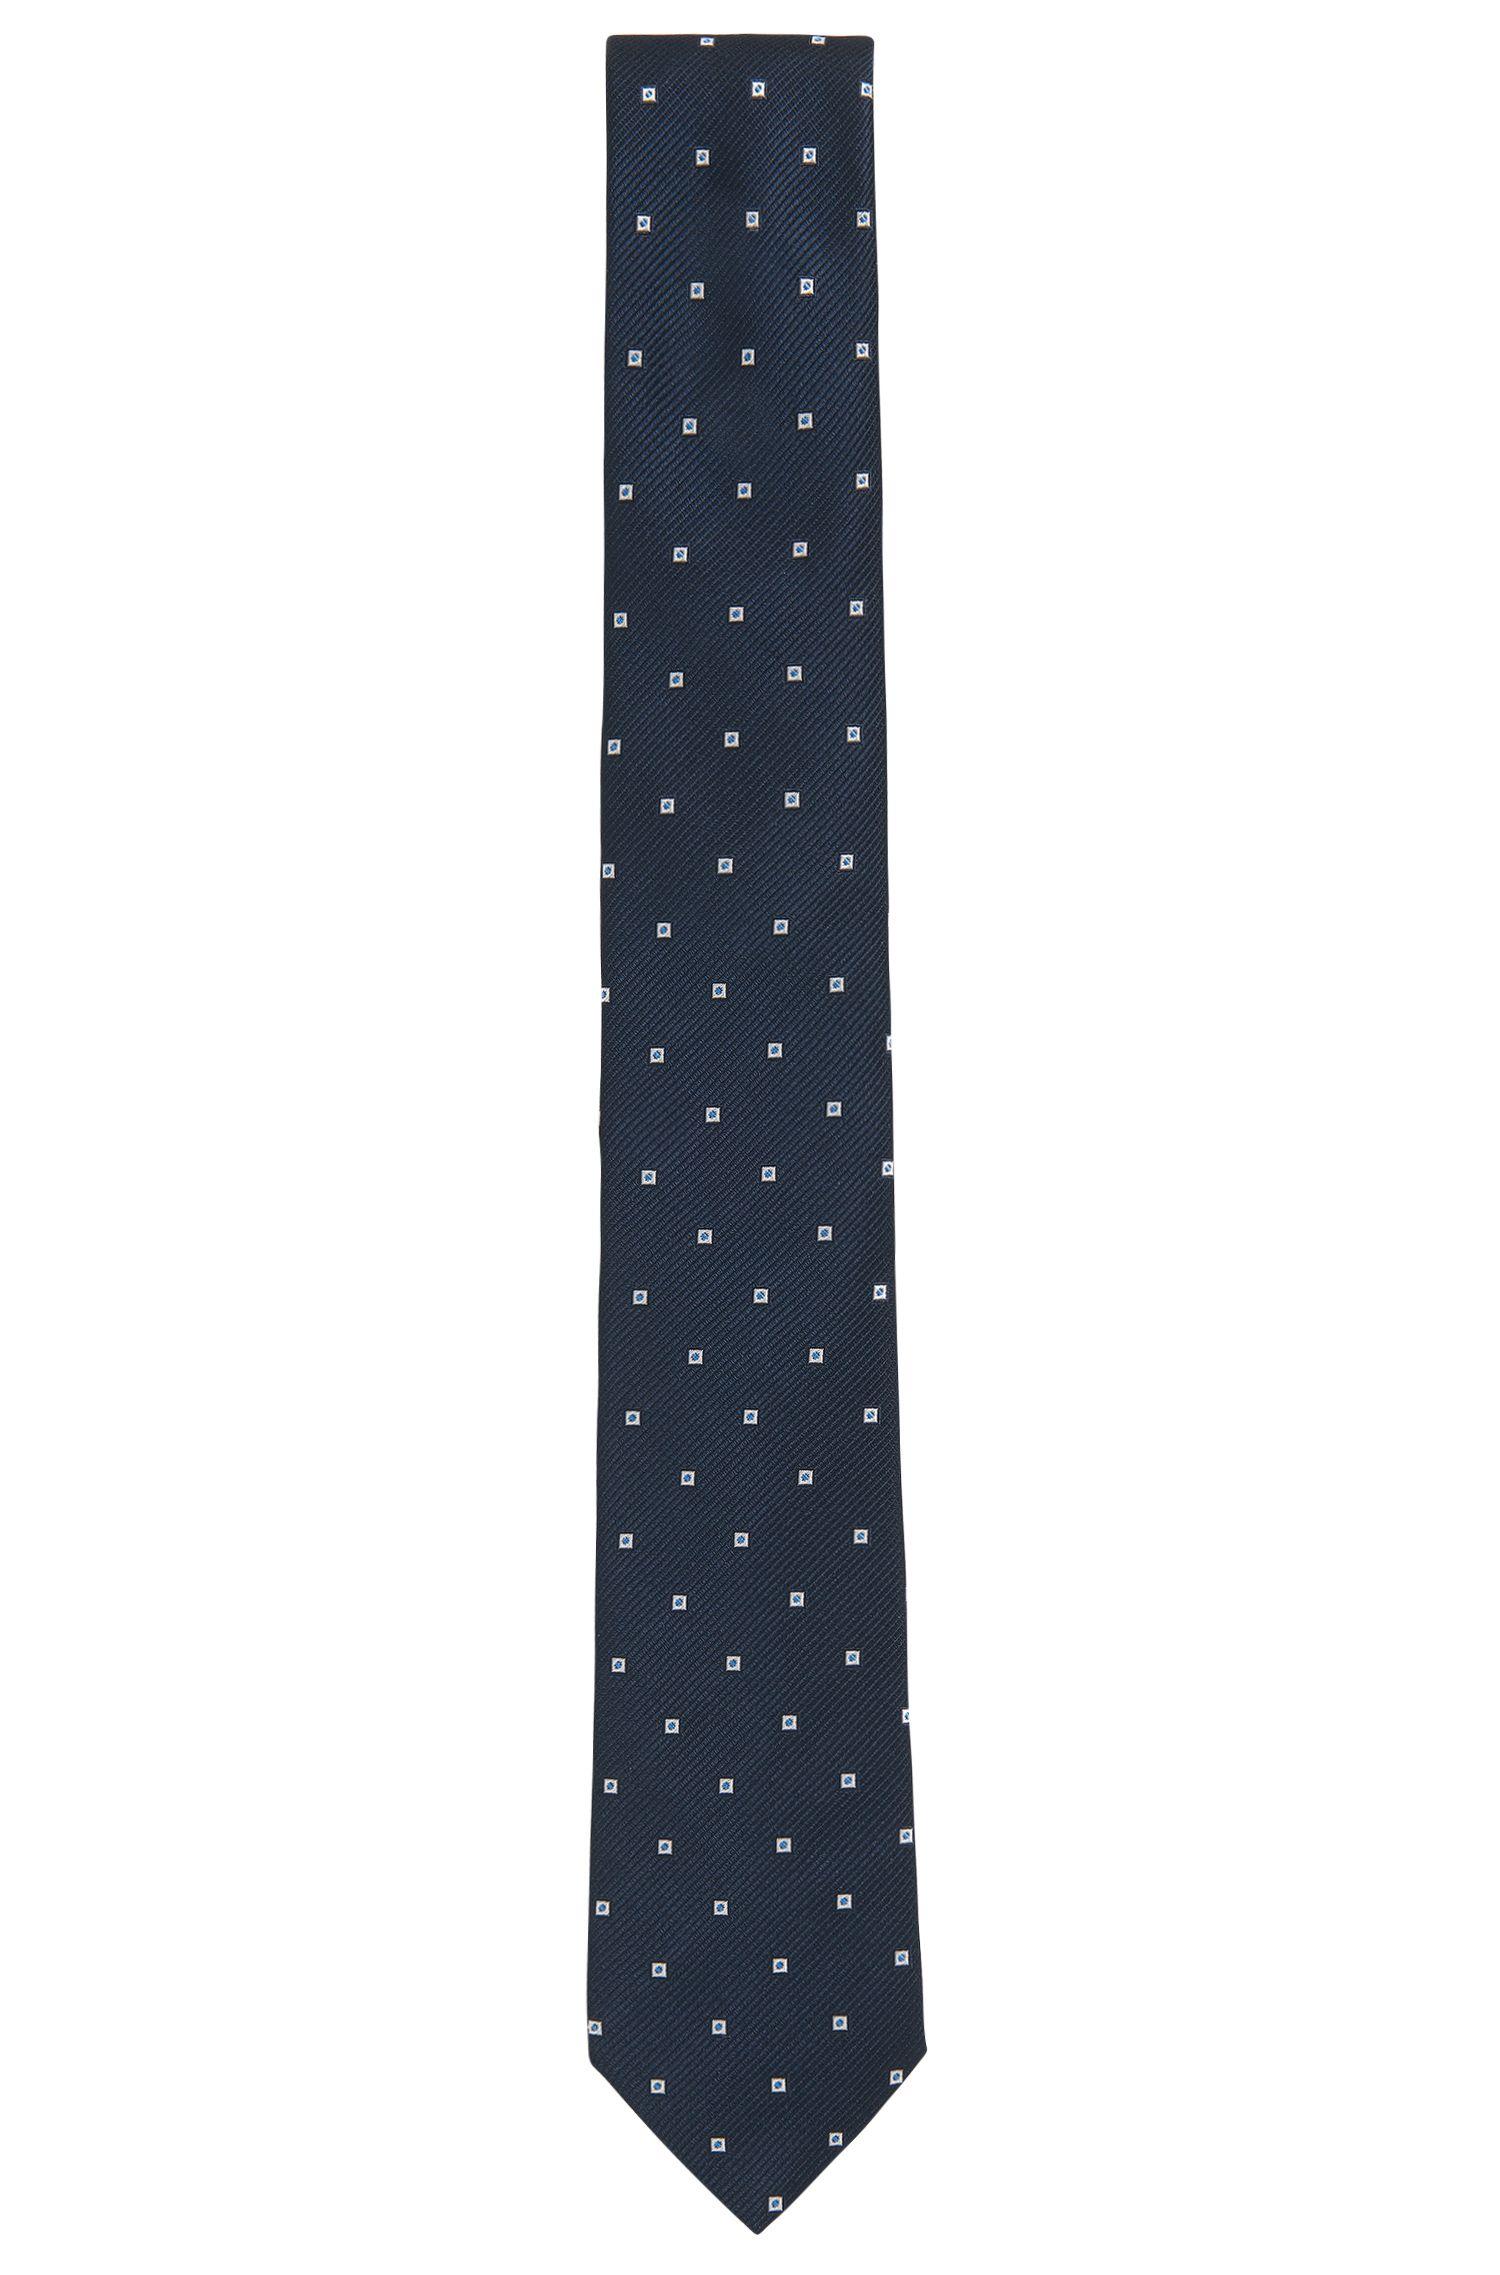 Gemusterte Krawatte aus garngefärbtem Seiden-Jacquard